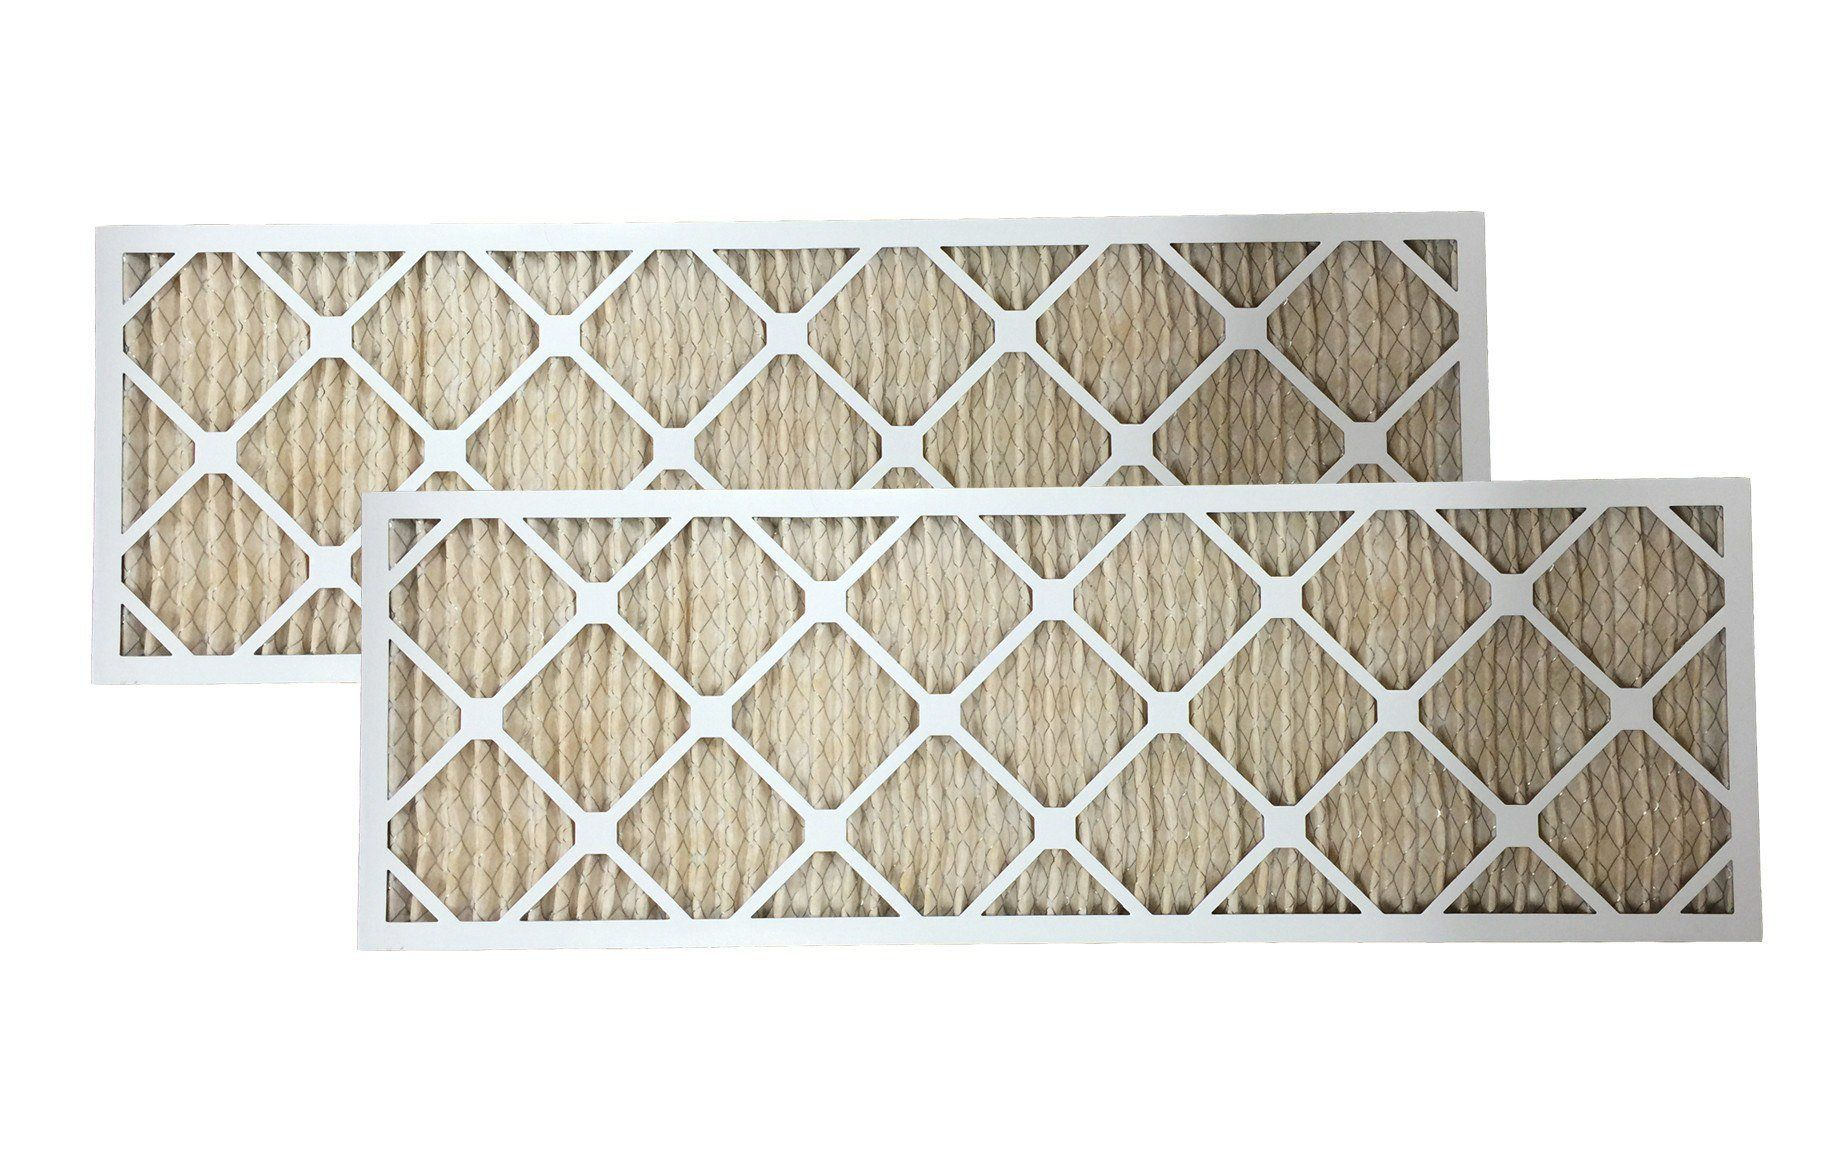 2 12x36x1 MERV11 Allergen Air Furnace Filters Furnace